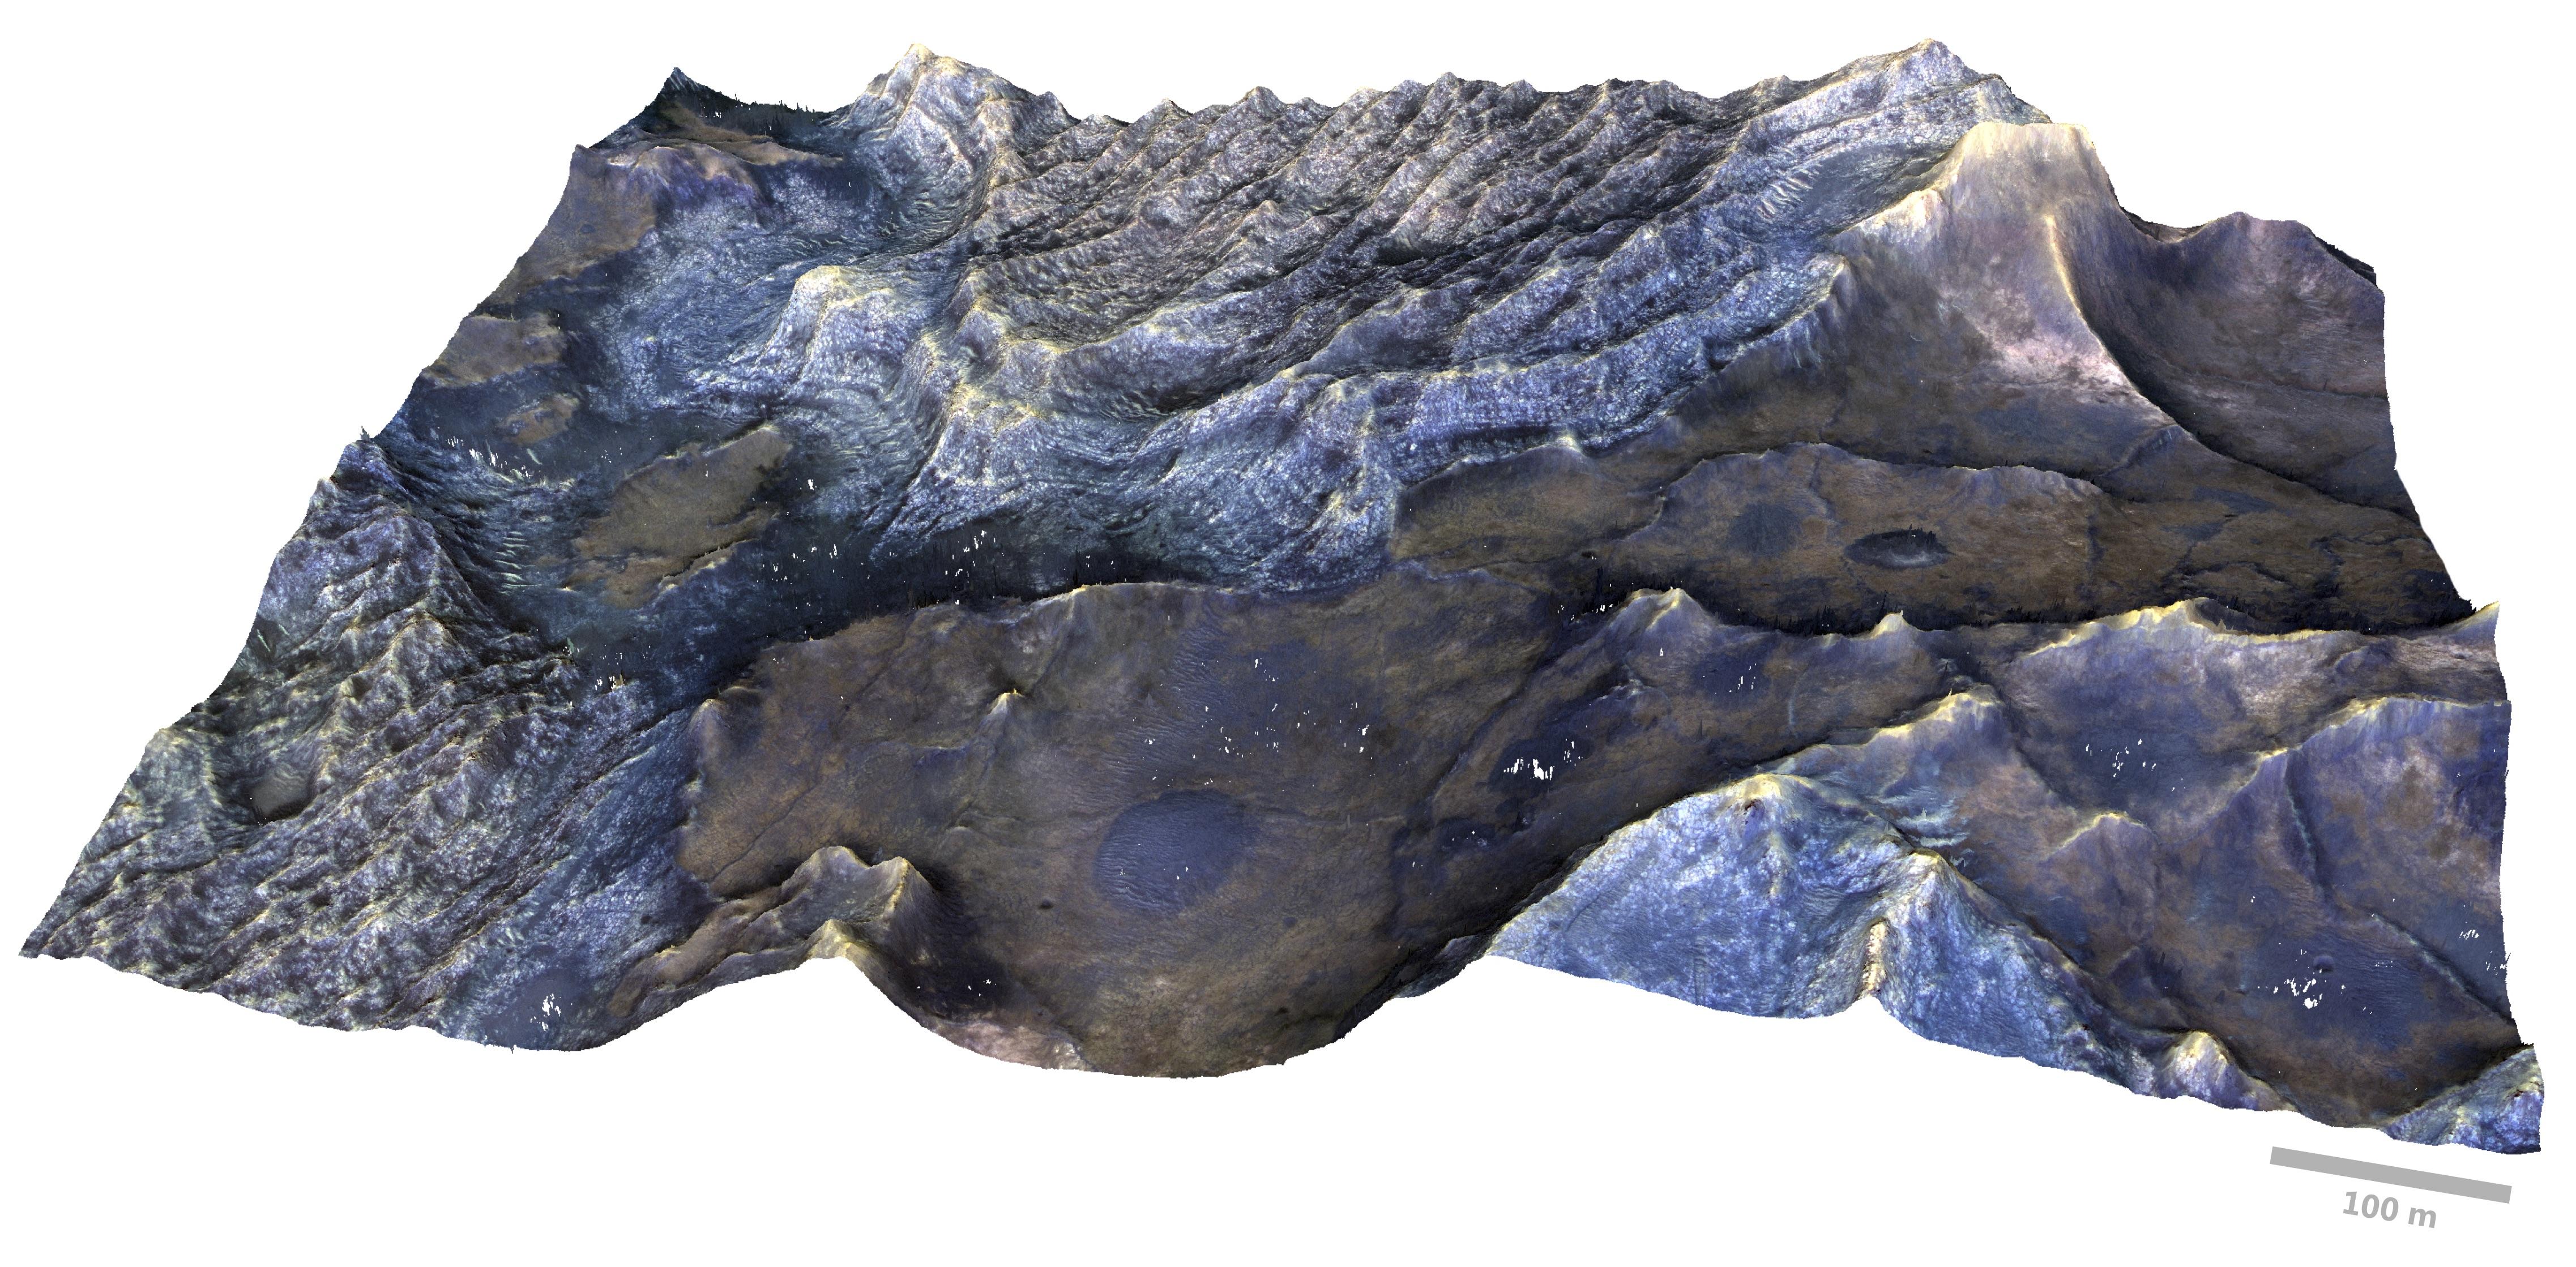 Jezero_crater_olivine_dtm_MRO.jpg